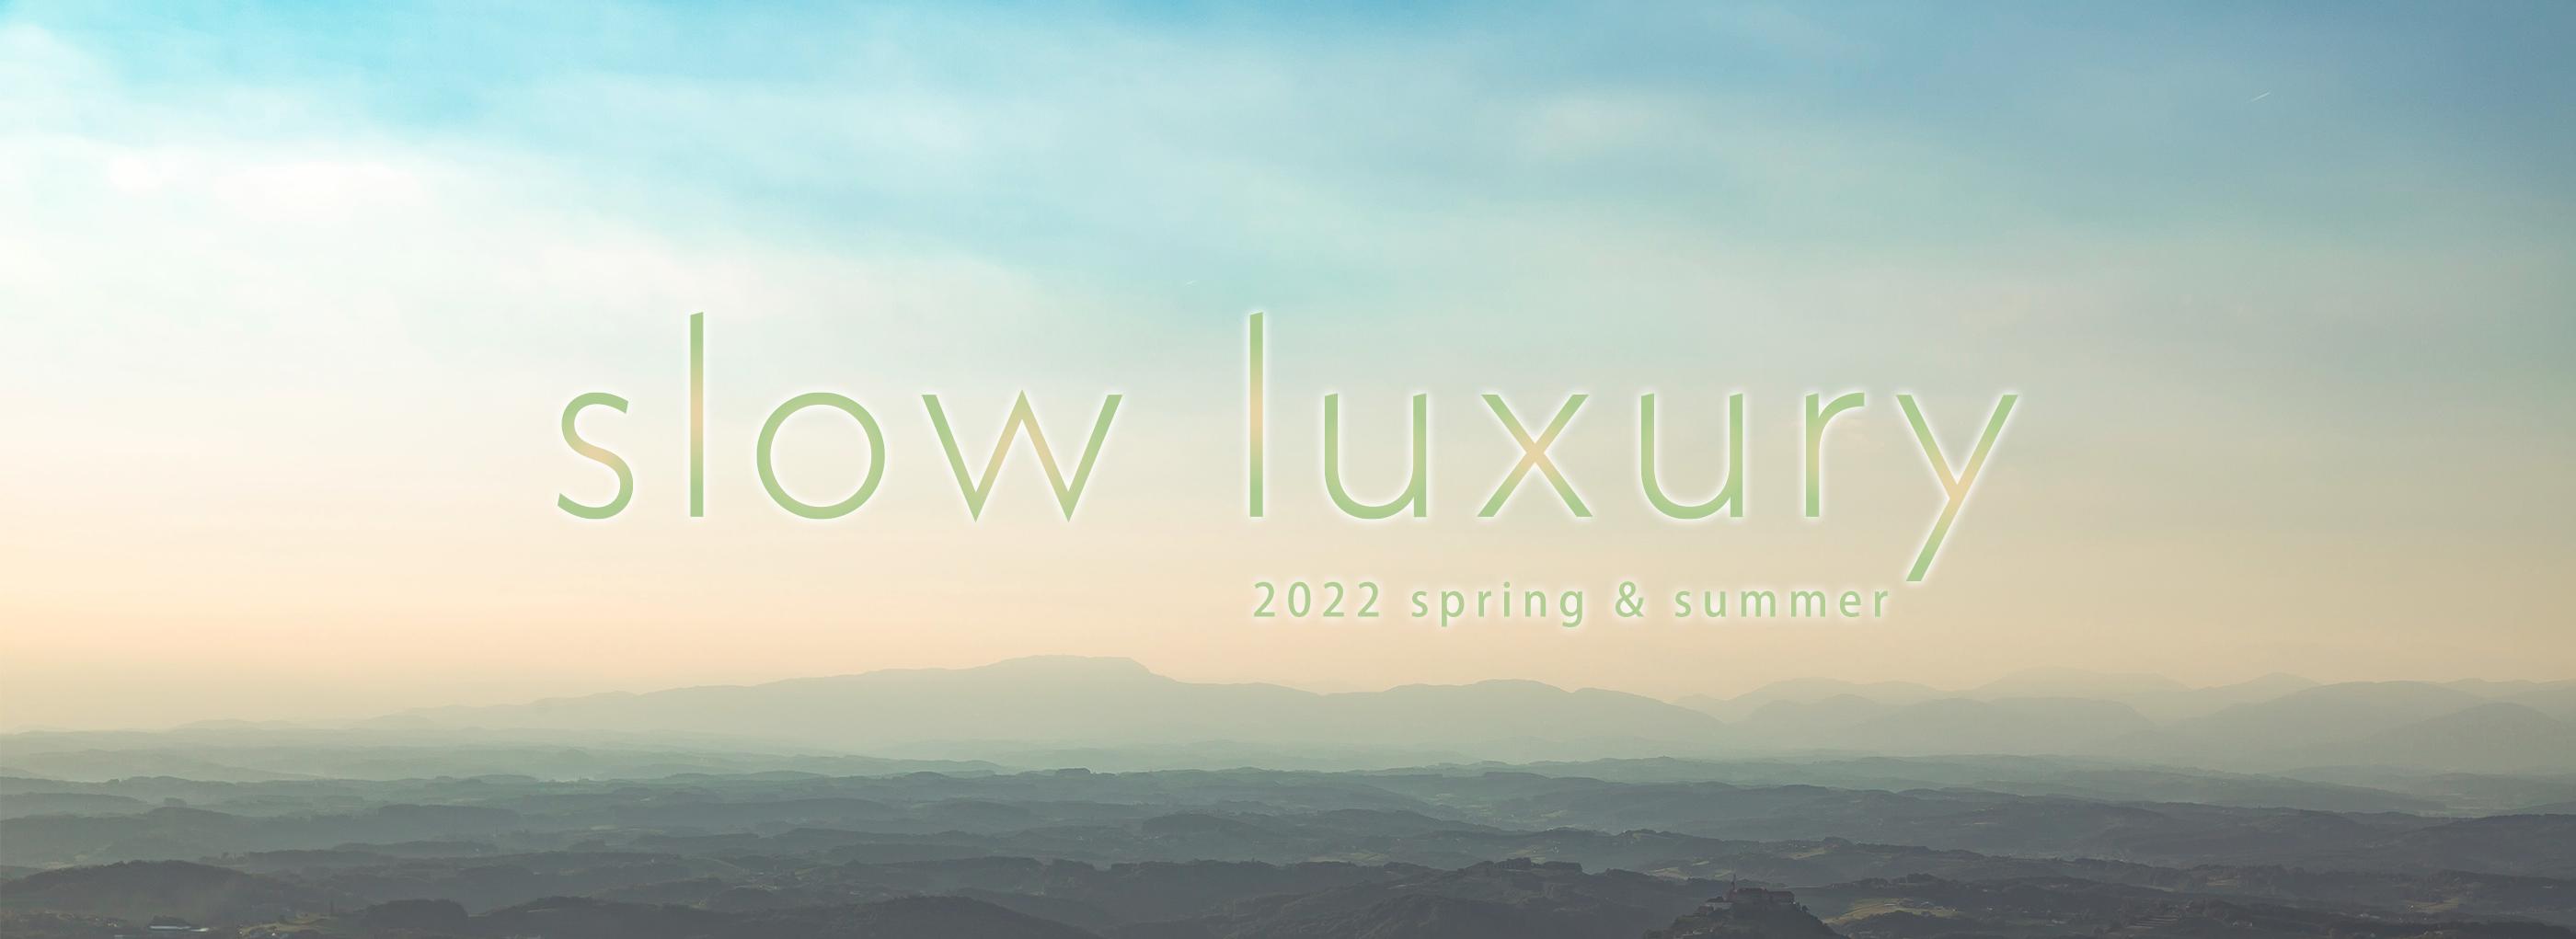 2022ss slow luxury トレンド ササキセルム